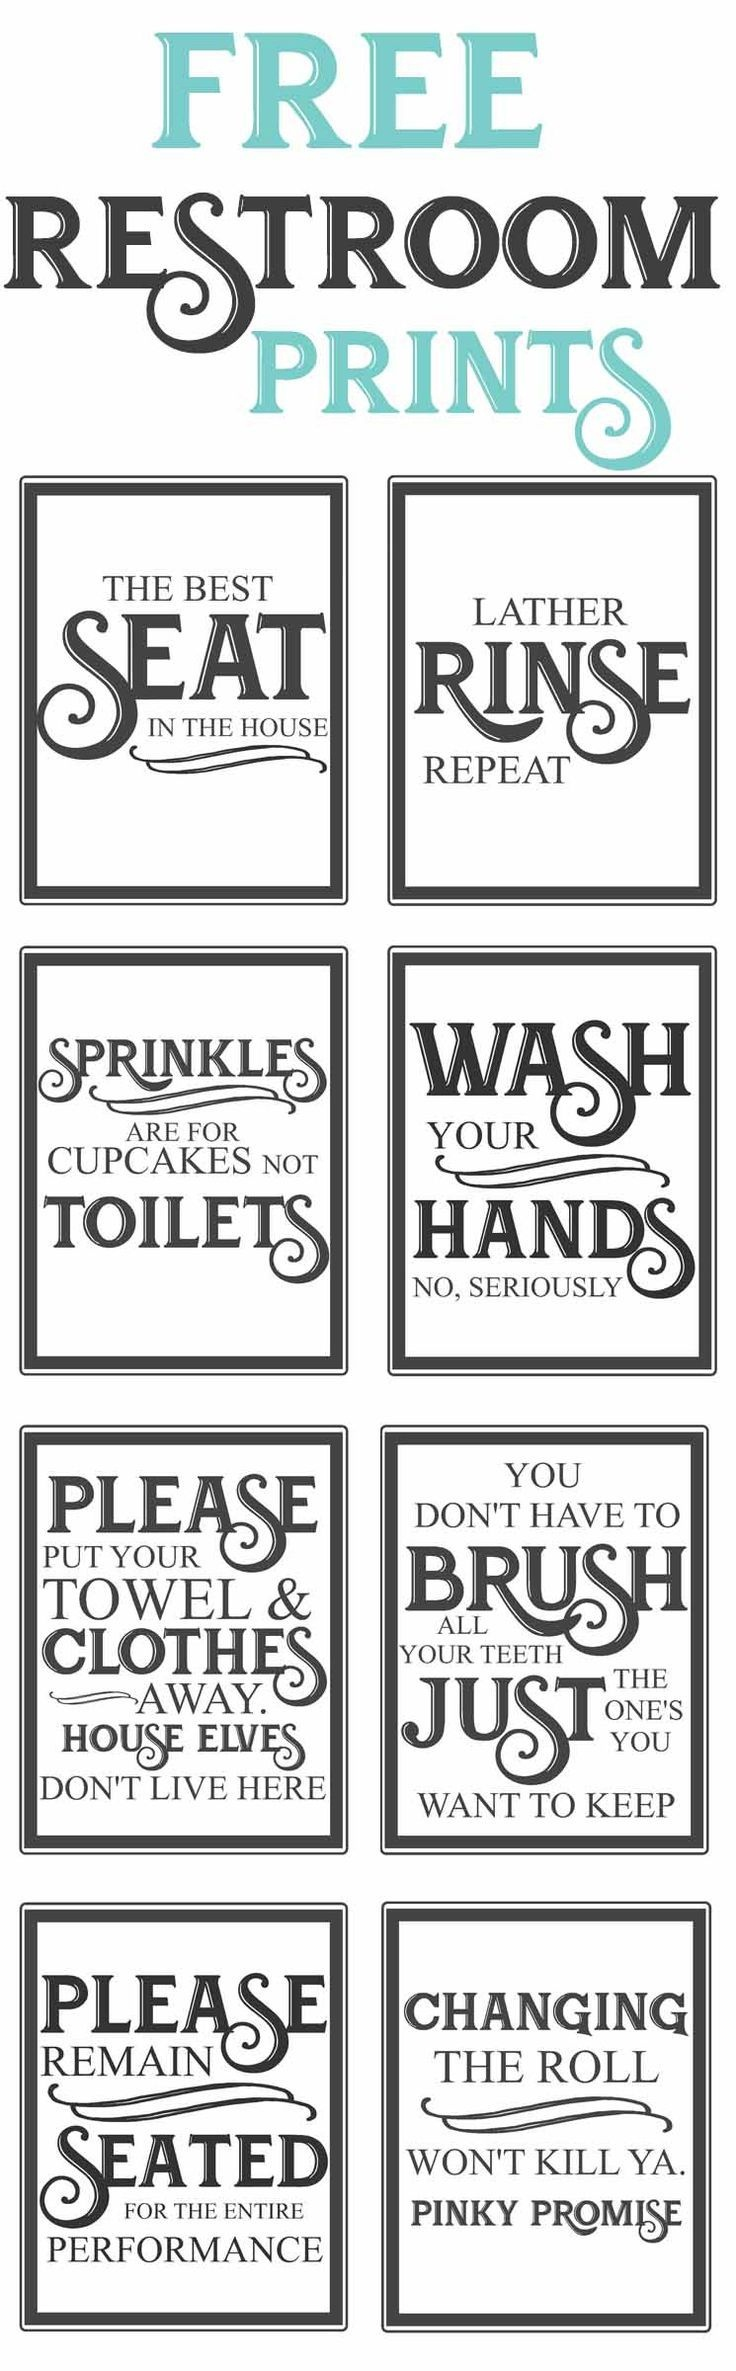 Free Vintage Bathroom Printables | Farmhouse | Diy Home Decor, Easy - Free Printable Flush The Toilet Signs